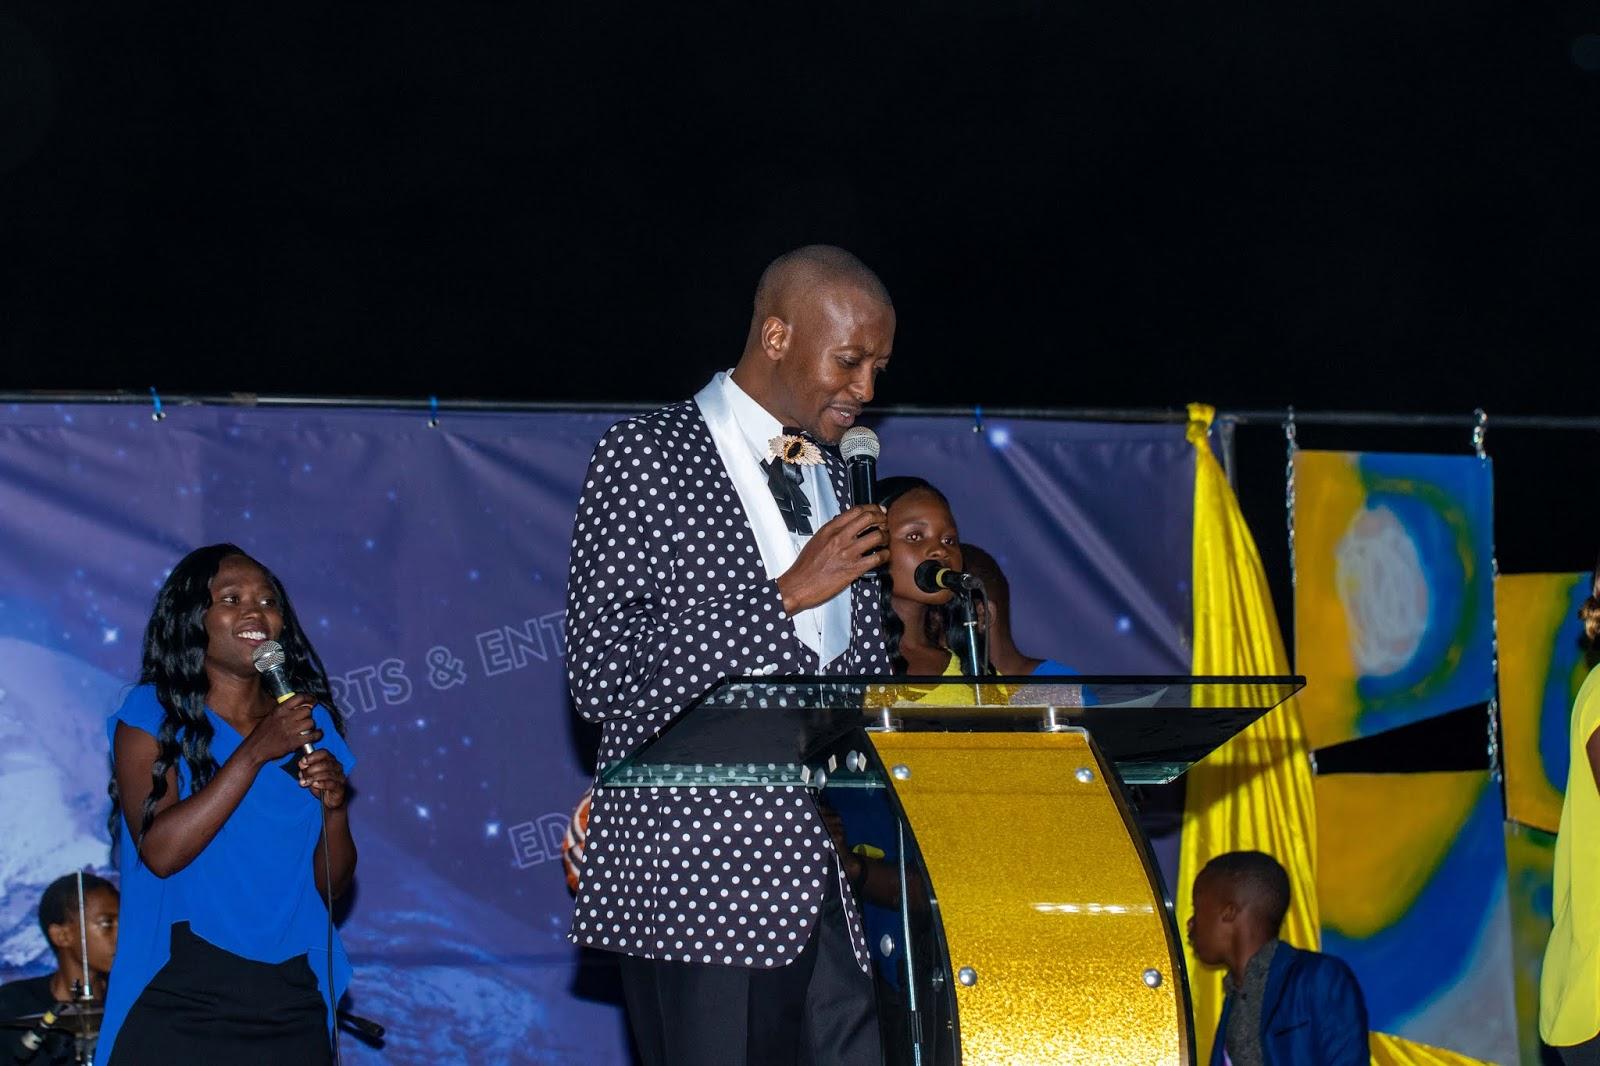 Apostle Pride Sbiyia and Overseer Maxwell Chinoruma On Tiyambuke 2018 Day One (Monday 3 September 2018 Evening)